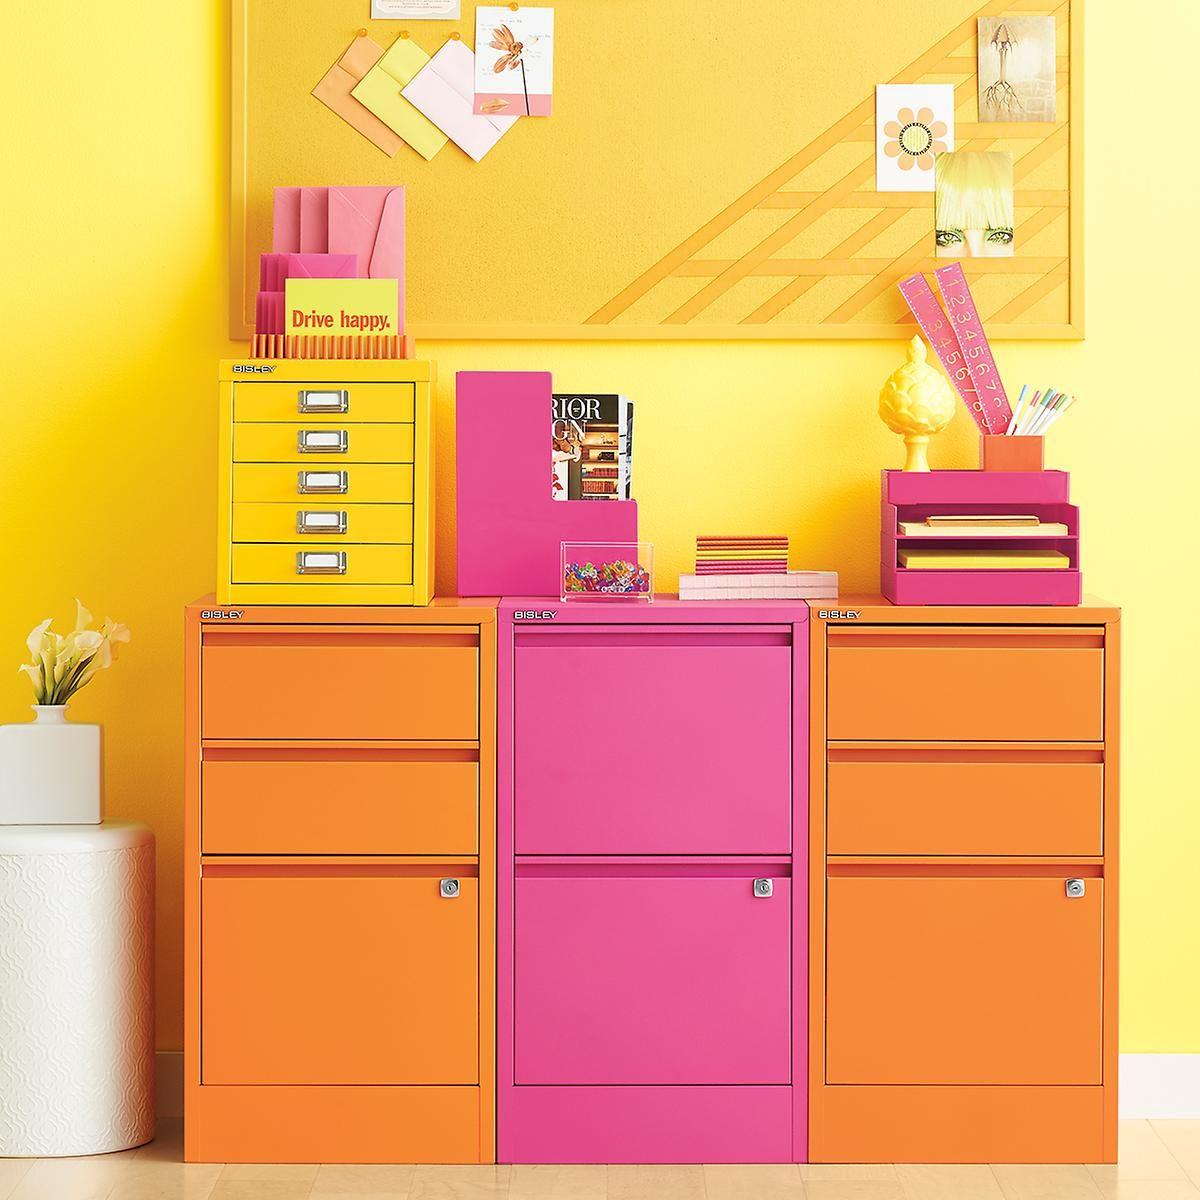 bs series filing handles pin red classic bisley cardinal cabinet drawer